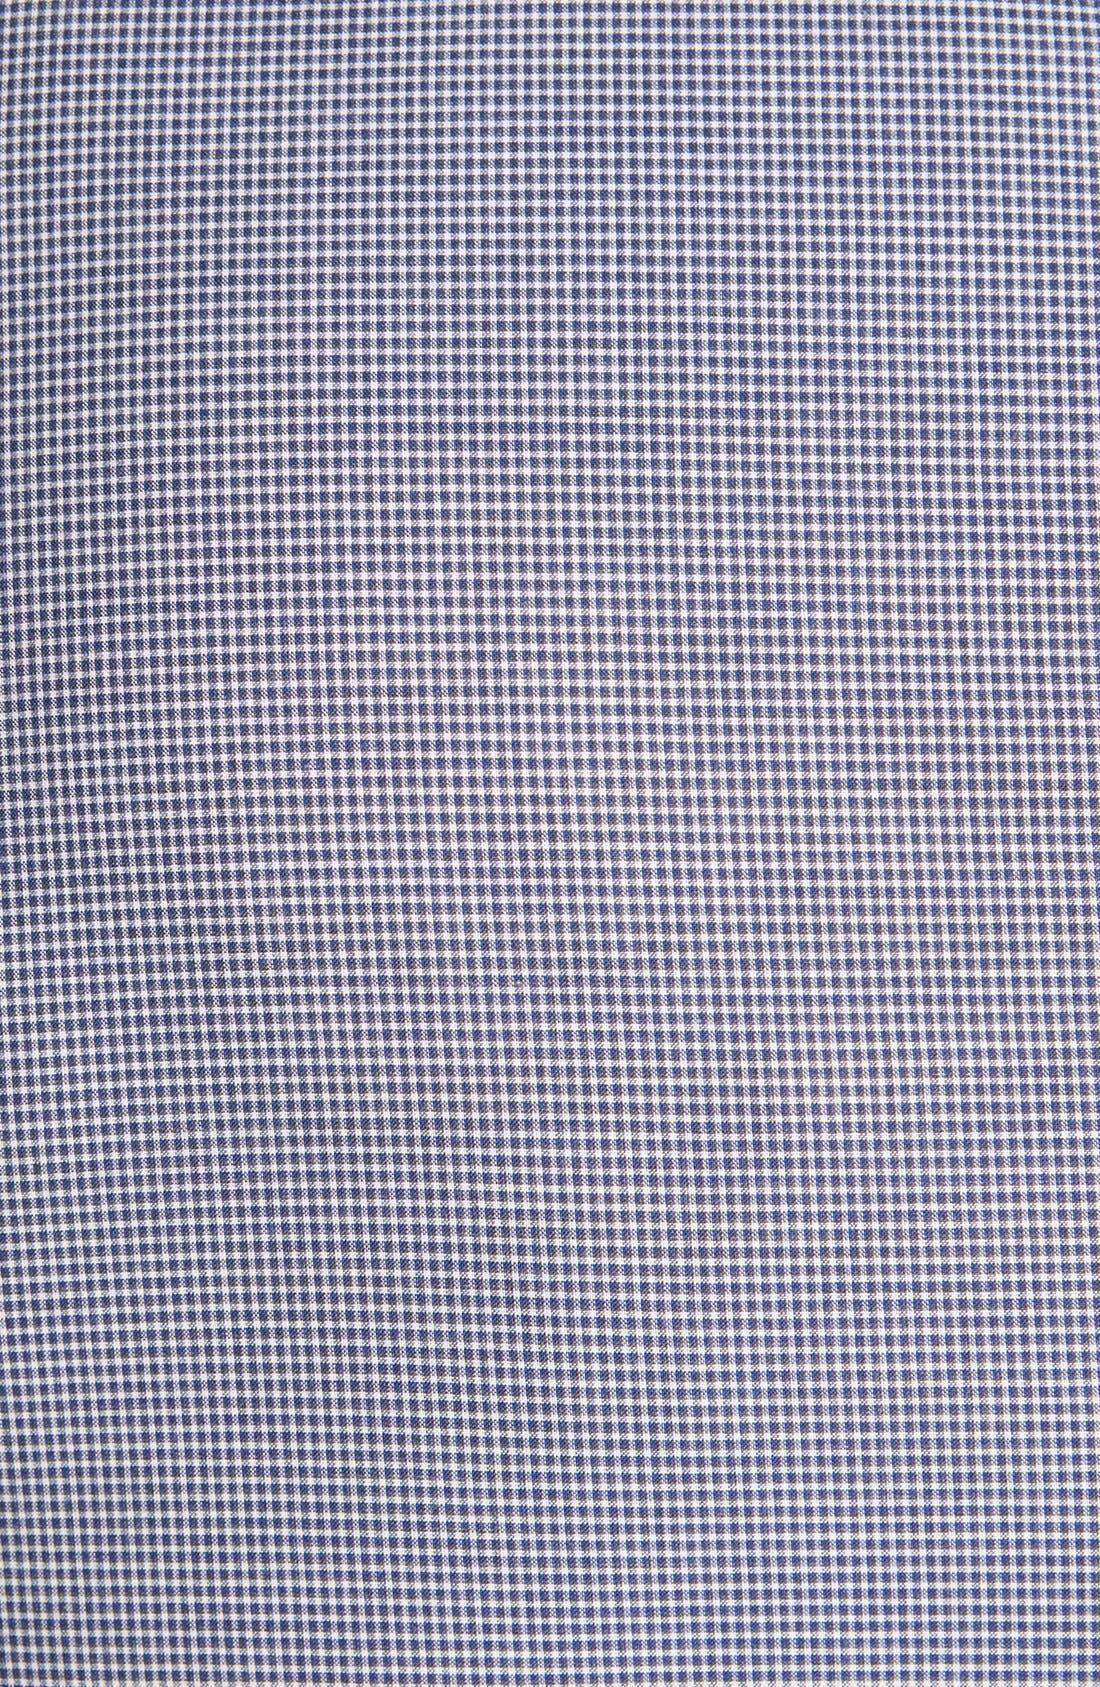 Alternate Image 3  - rag & bone 'Charles' Micro Gingham Woven Shirt